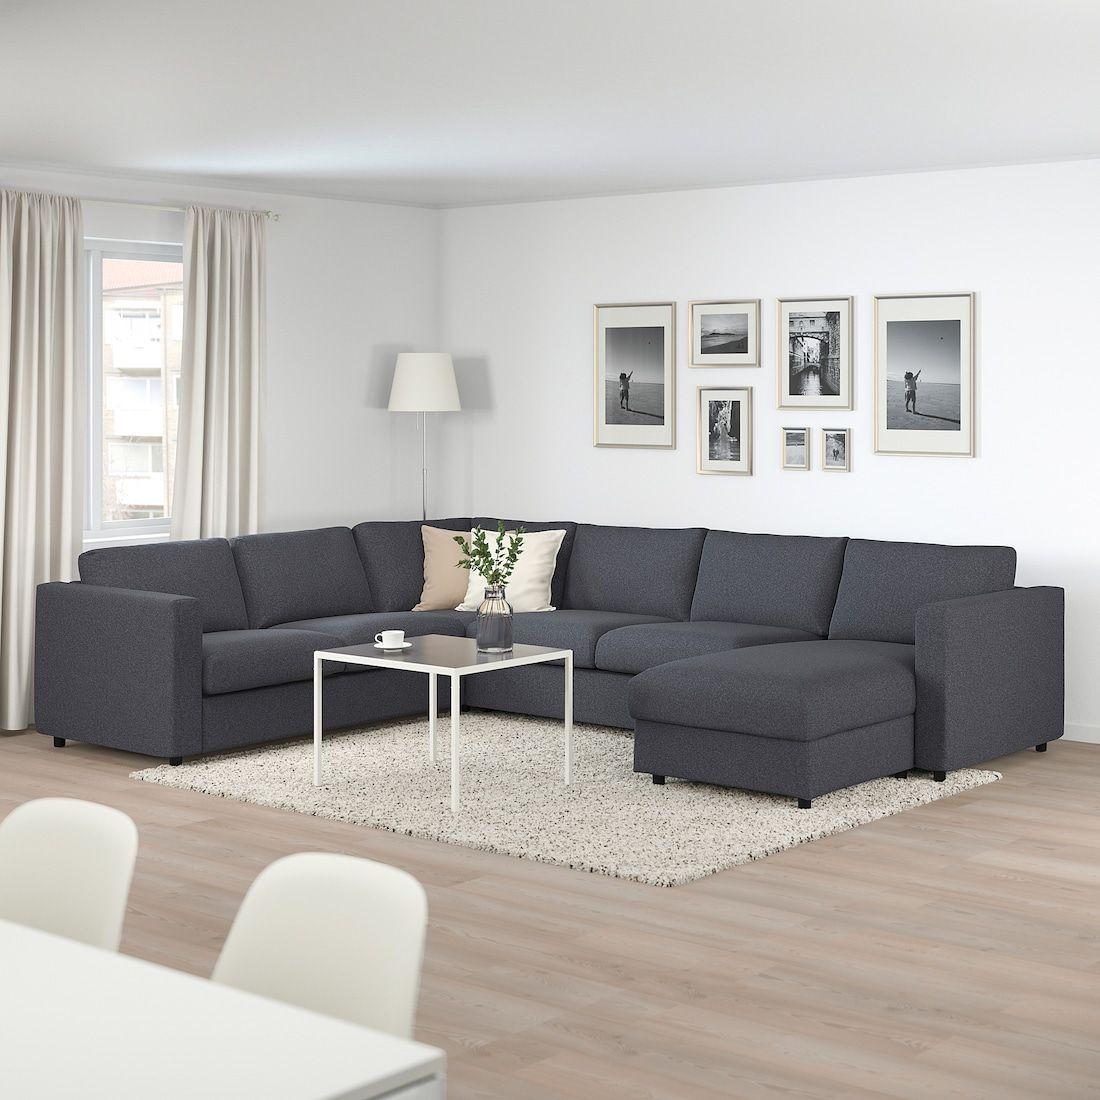 Ikea Us Furniture And Home Furnishings Living Room Sofa Design Corner Sofa Living Room Living Room Grey